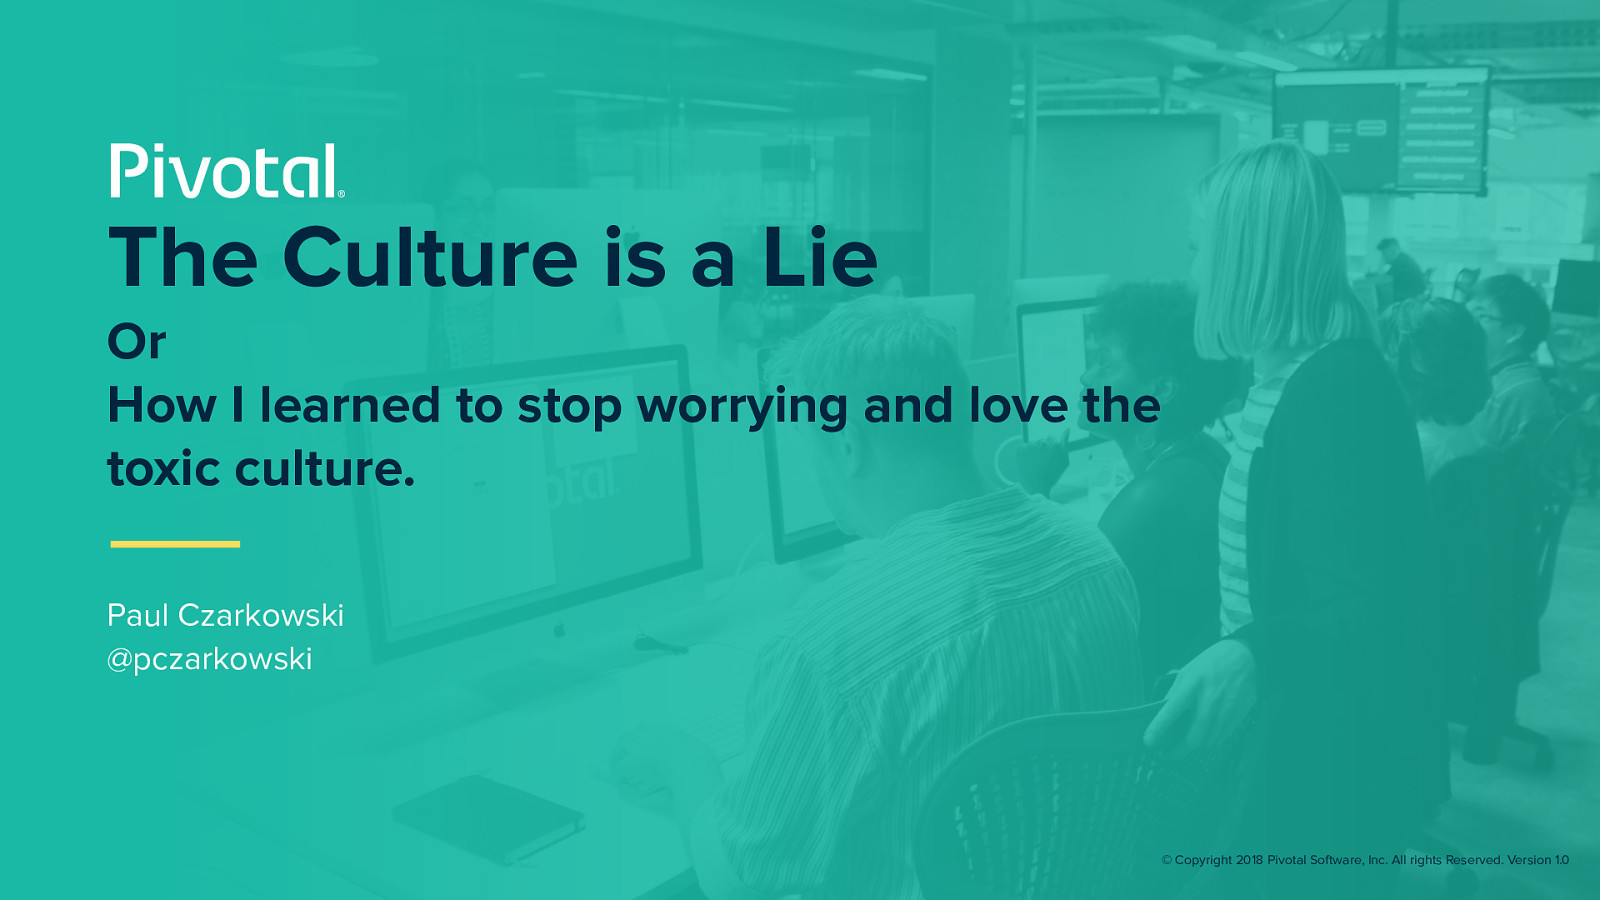 DevOps - The Culture is a Lie